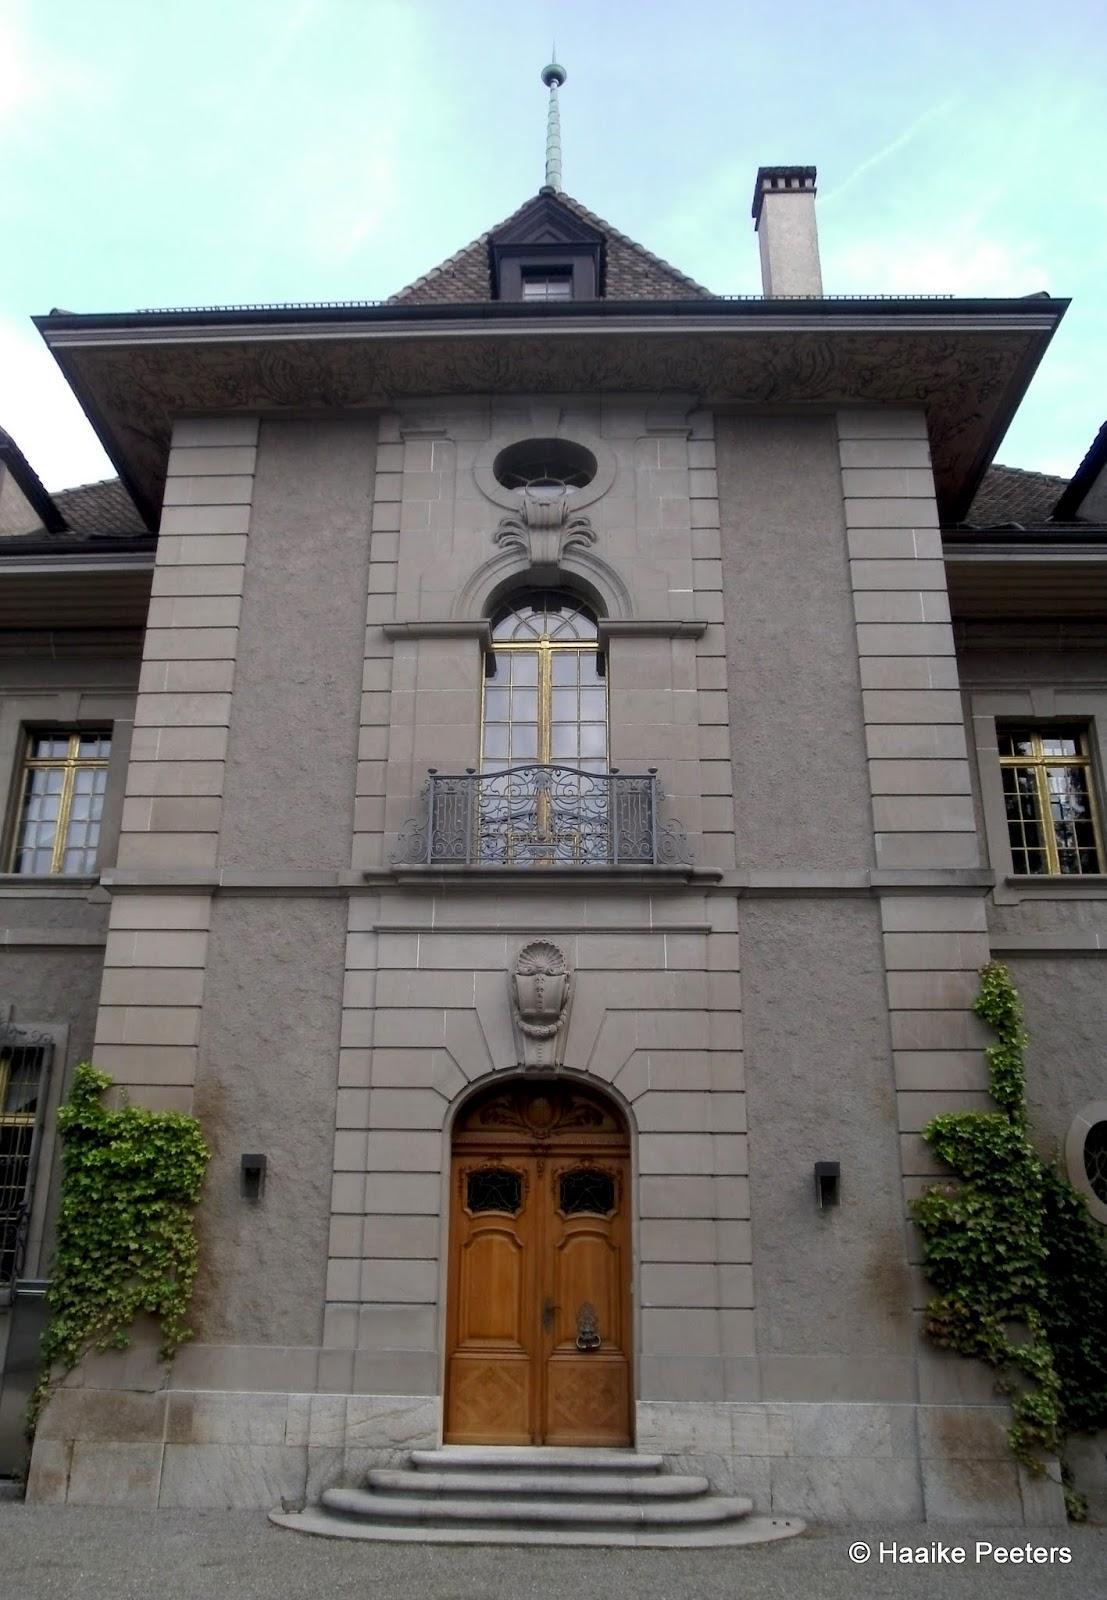 Swiss Centre for Global Dialogue (Le petit requin)